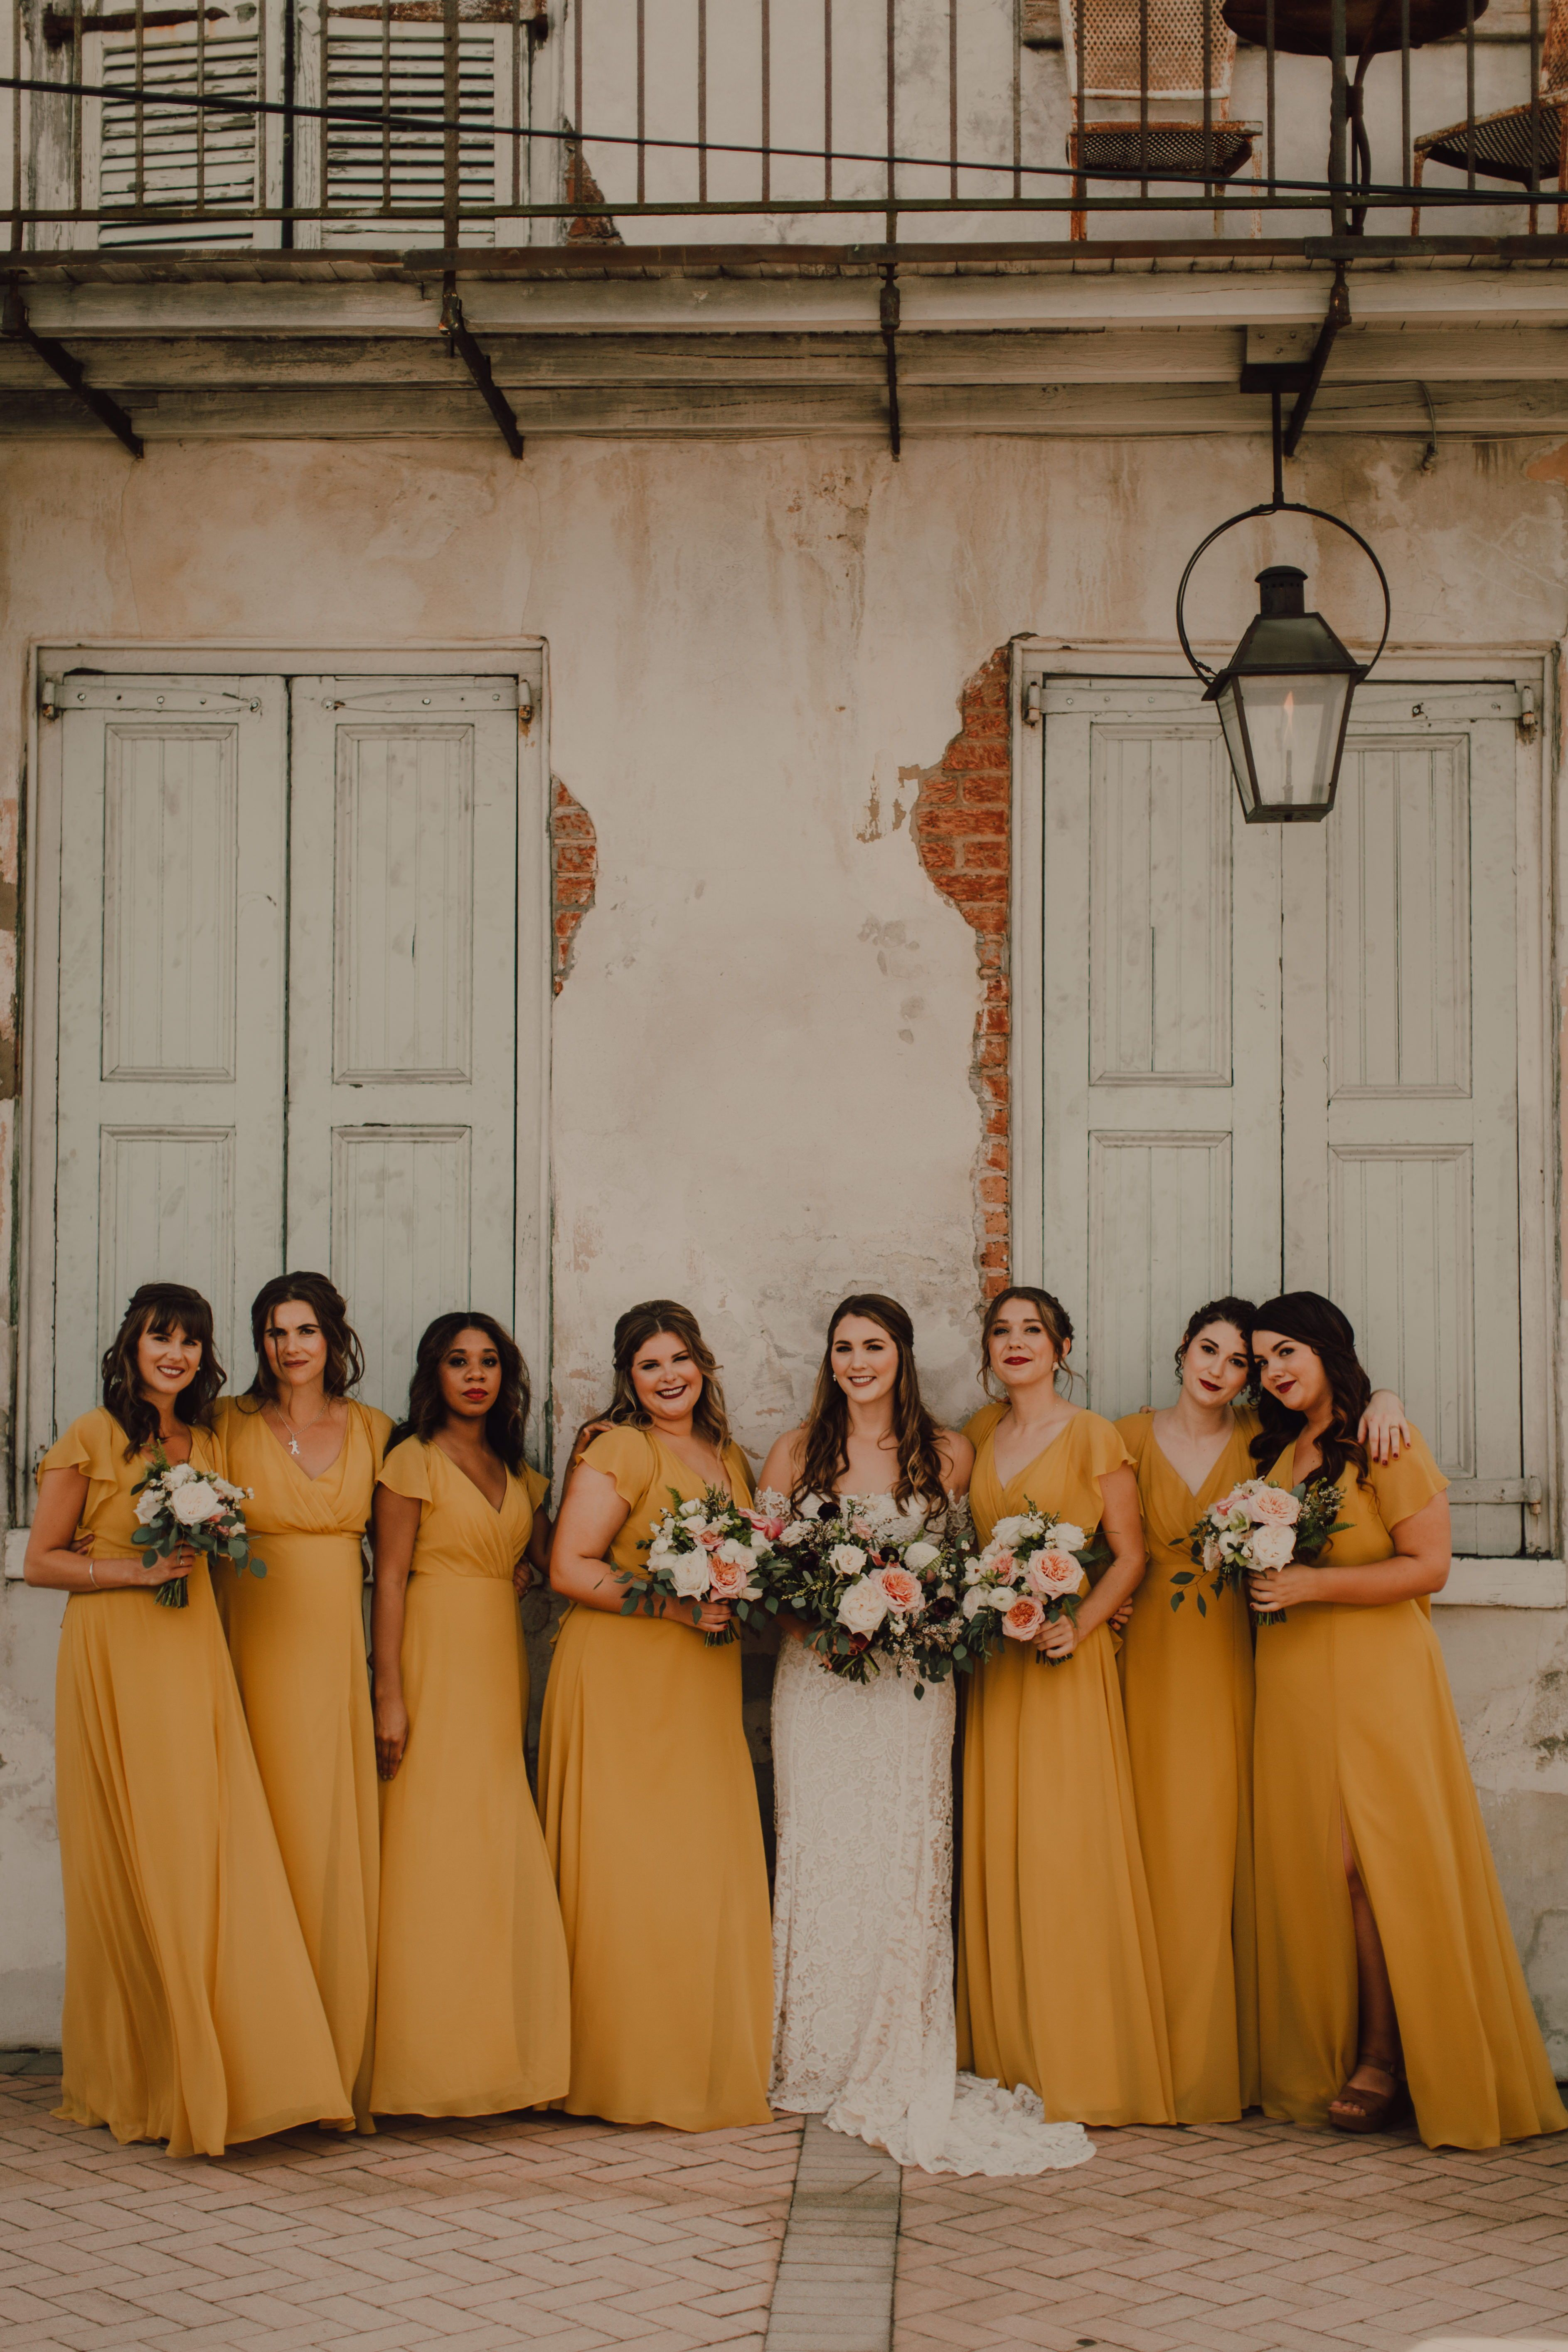 Mustard Yellow Bridesmaids The Alanna Dress Features Flutter Sleeves That Create A Roman Yellow Bridesmaid Dresses Fall Bridesmaid Dresses Yellow Bridesmaids [ 5659 x 3773 Pixel ]